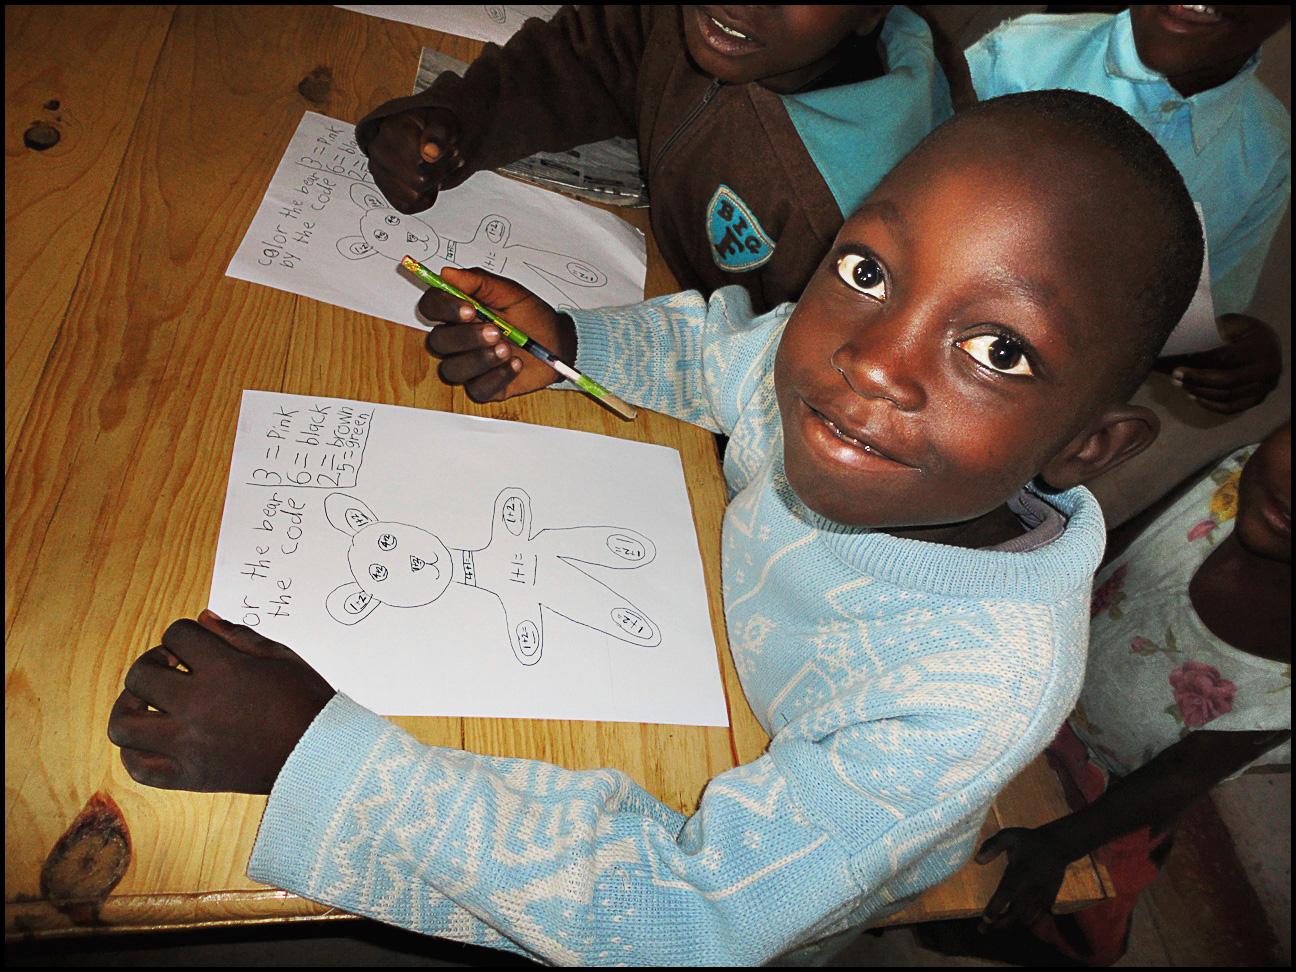 Worksheets For School Kids In Africa